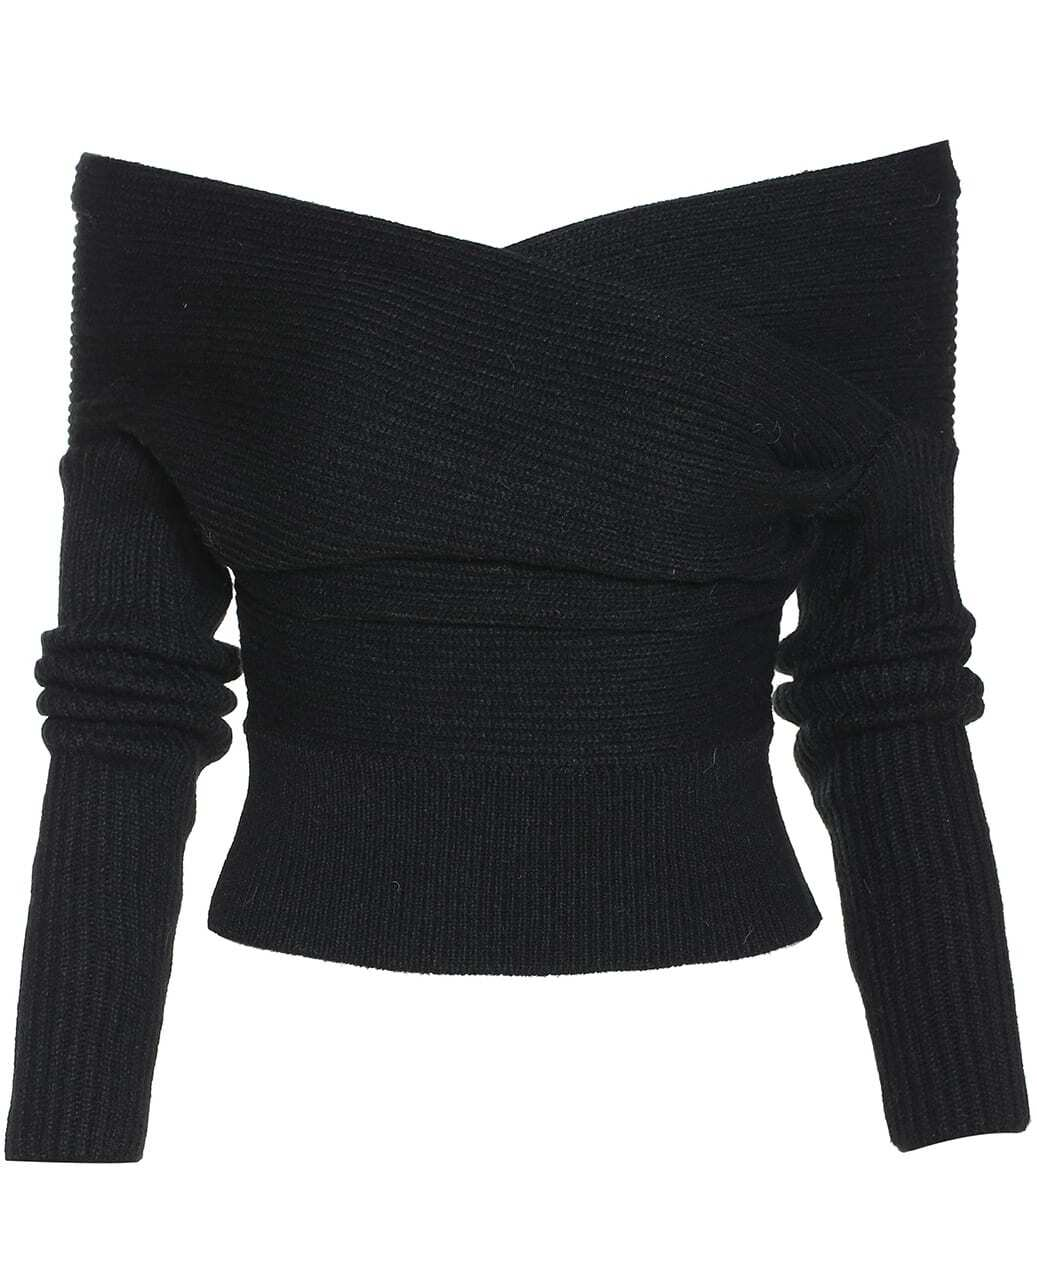 Black Boat Neck Ribbed Sweater -SheIn(Sheinside)